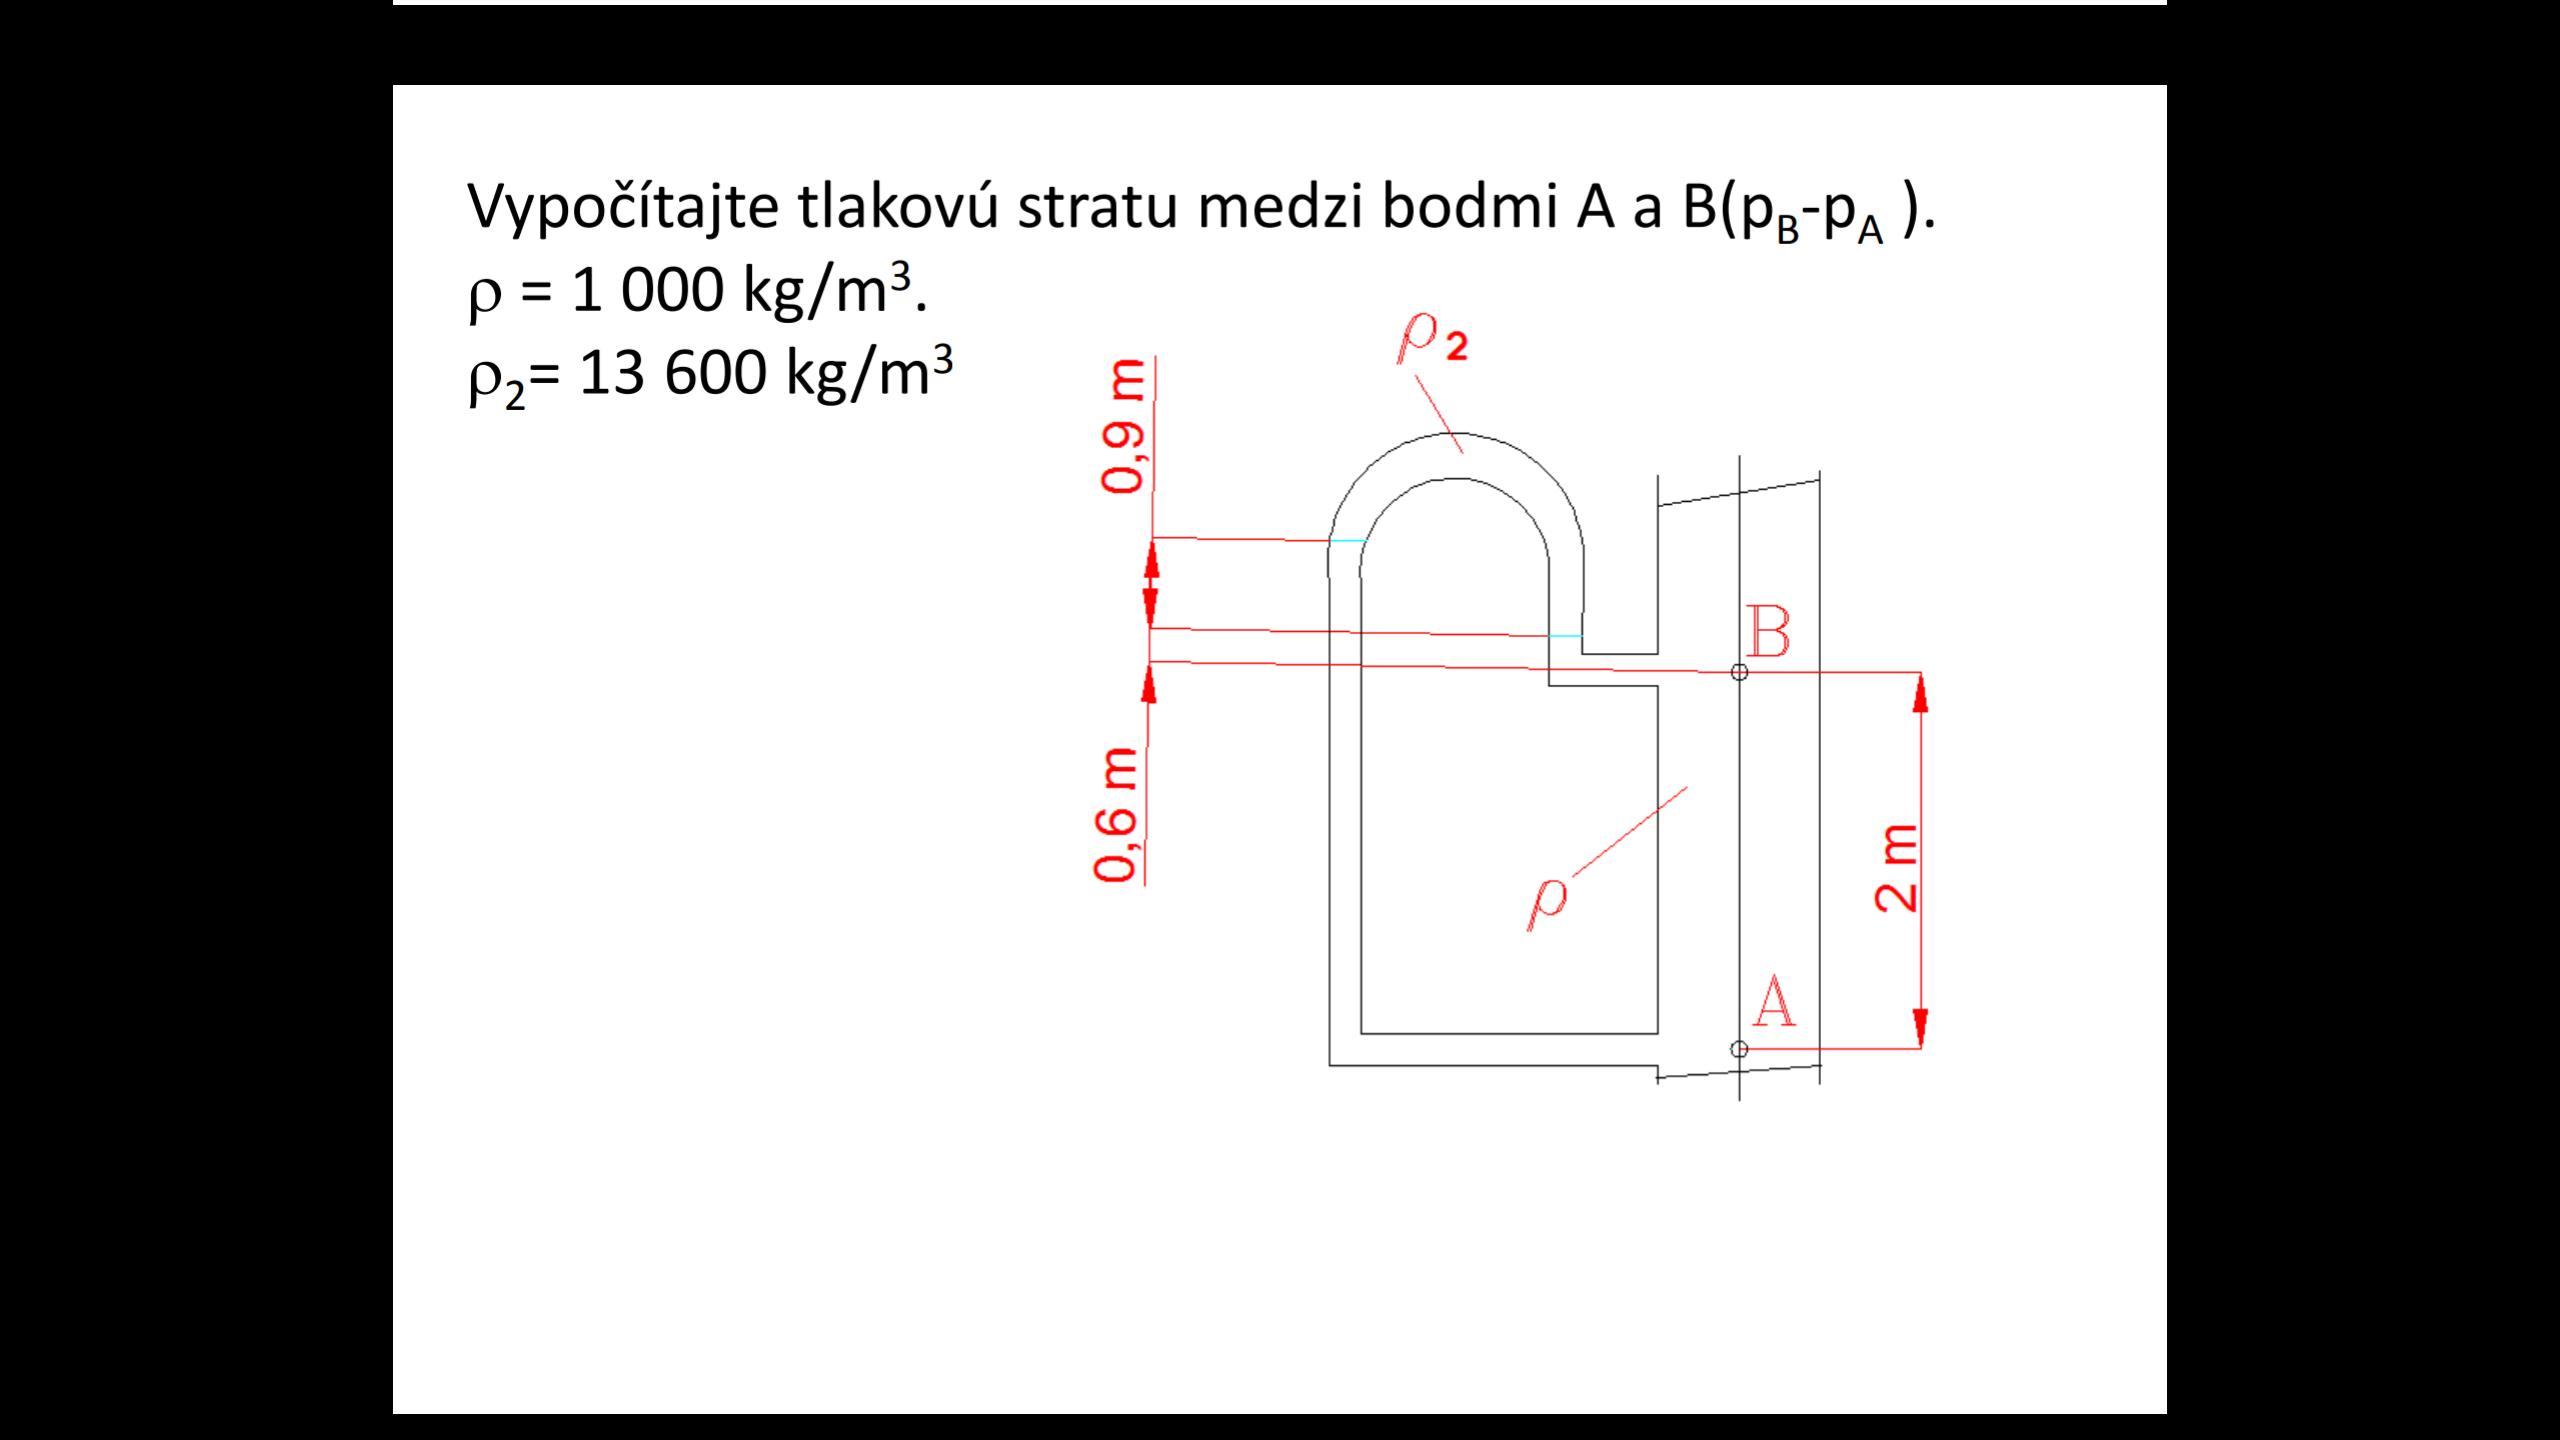 http://forum.matematika.cz/upload3/img/2018-06/12864_probl%25C3%25A9m.png